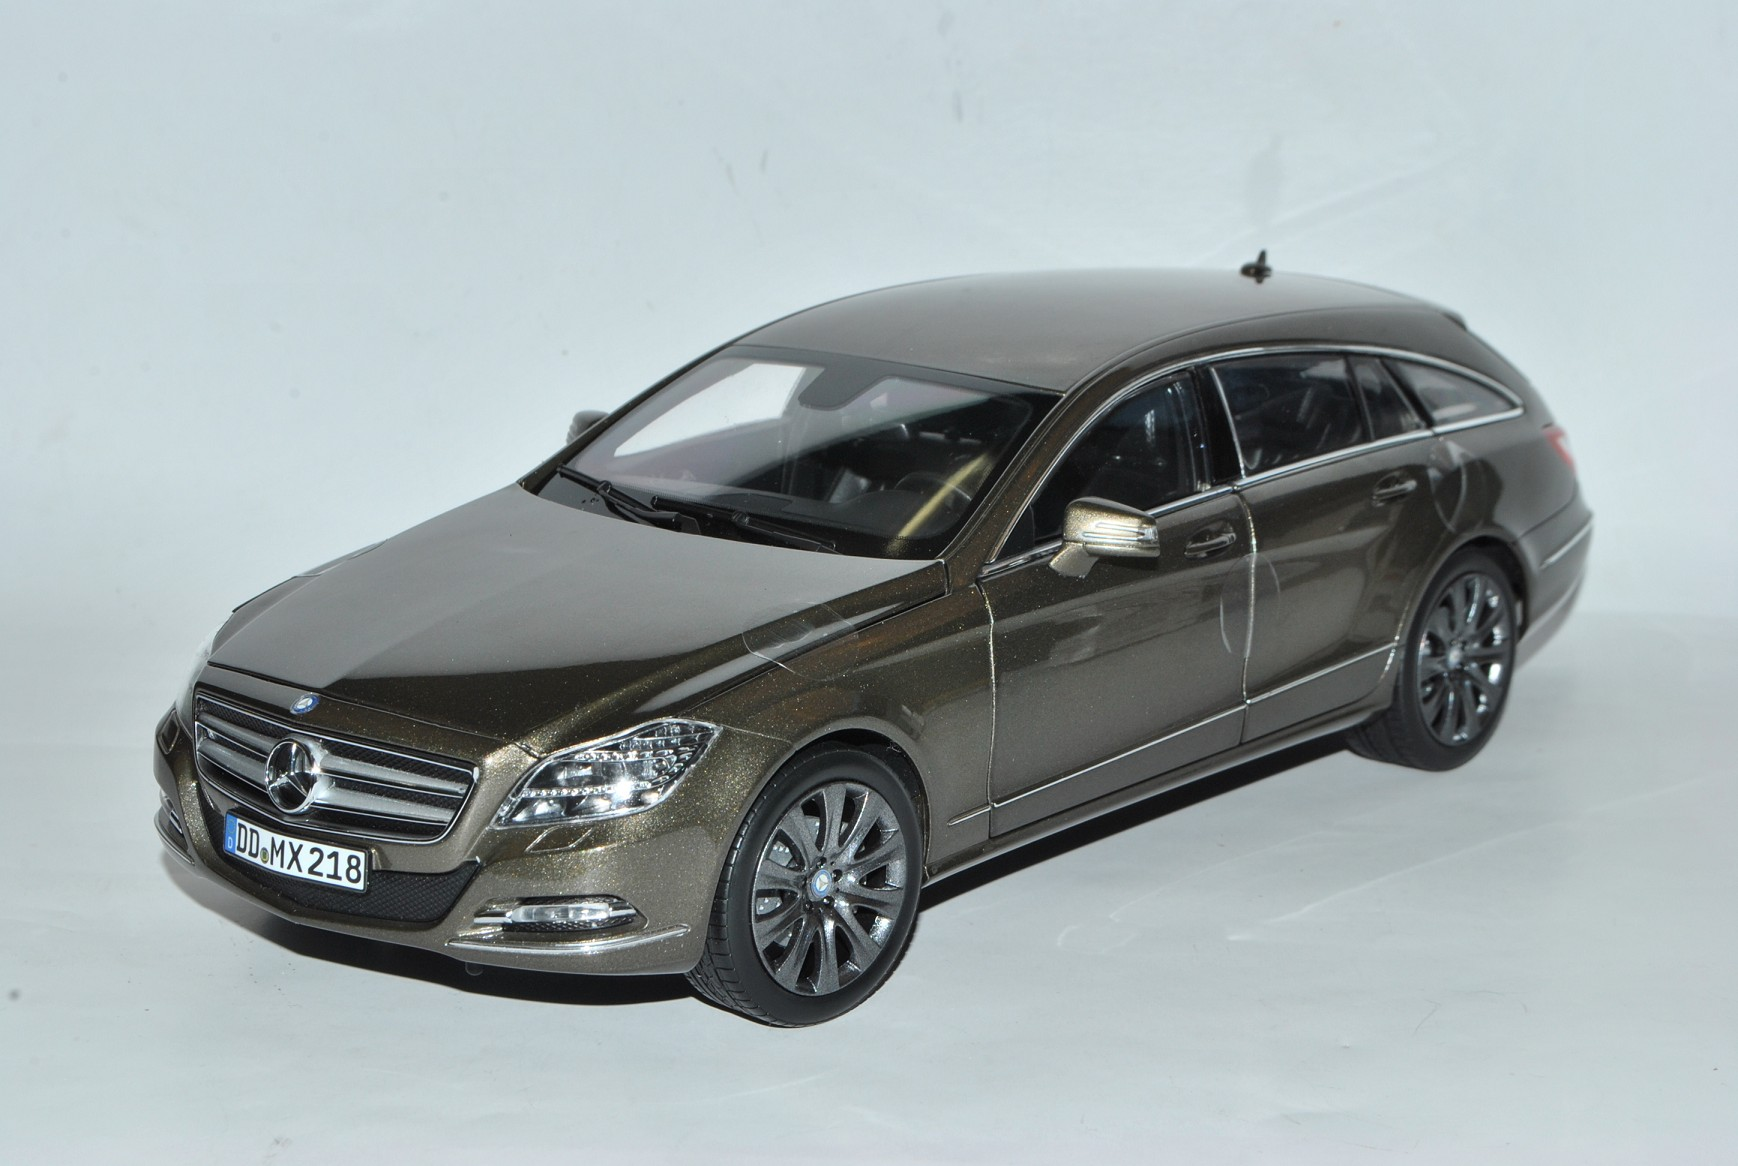 Mercedes-Benz CLS 500 Shooting Brake Brake Brake Indium Gris x218 Coupe Combi à partir de 2011 1/18... | Vendre Prix  8b3c15